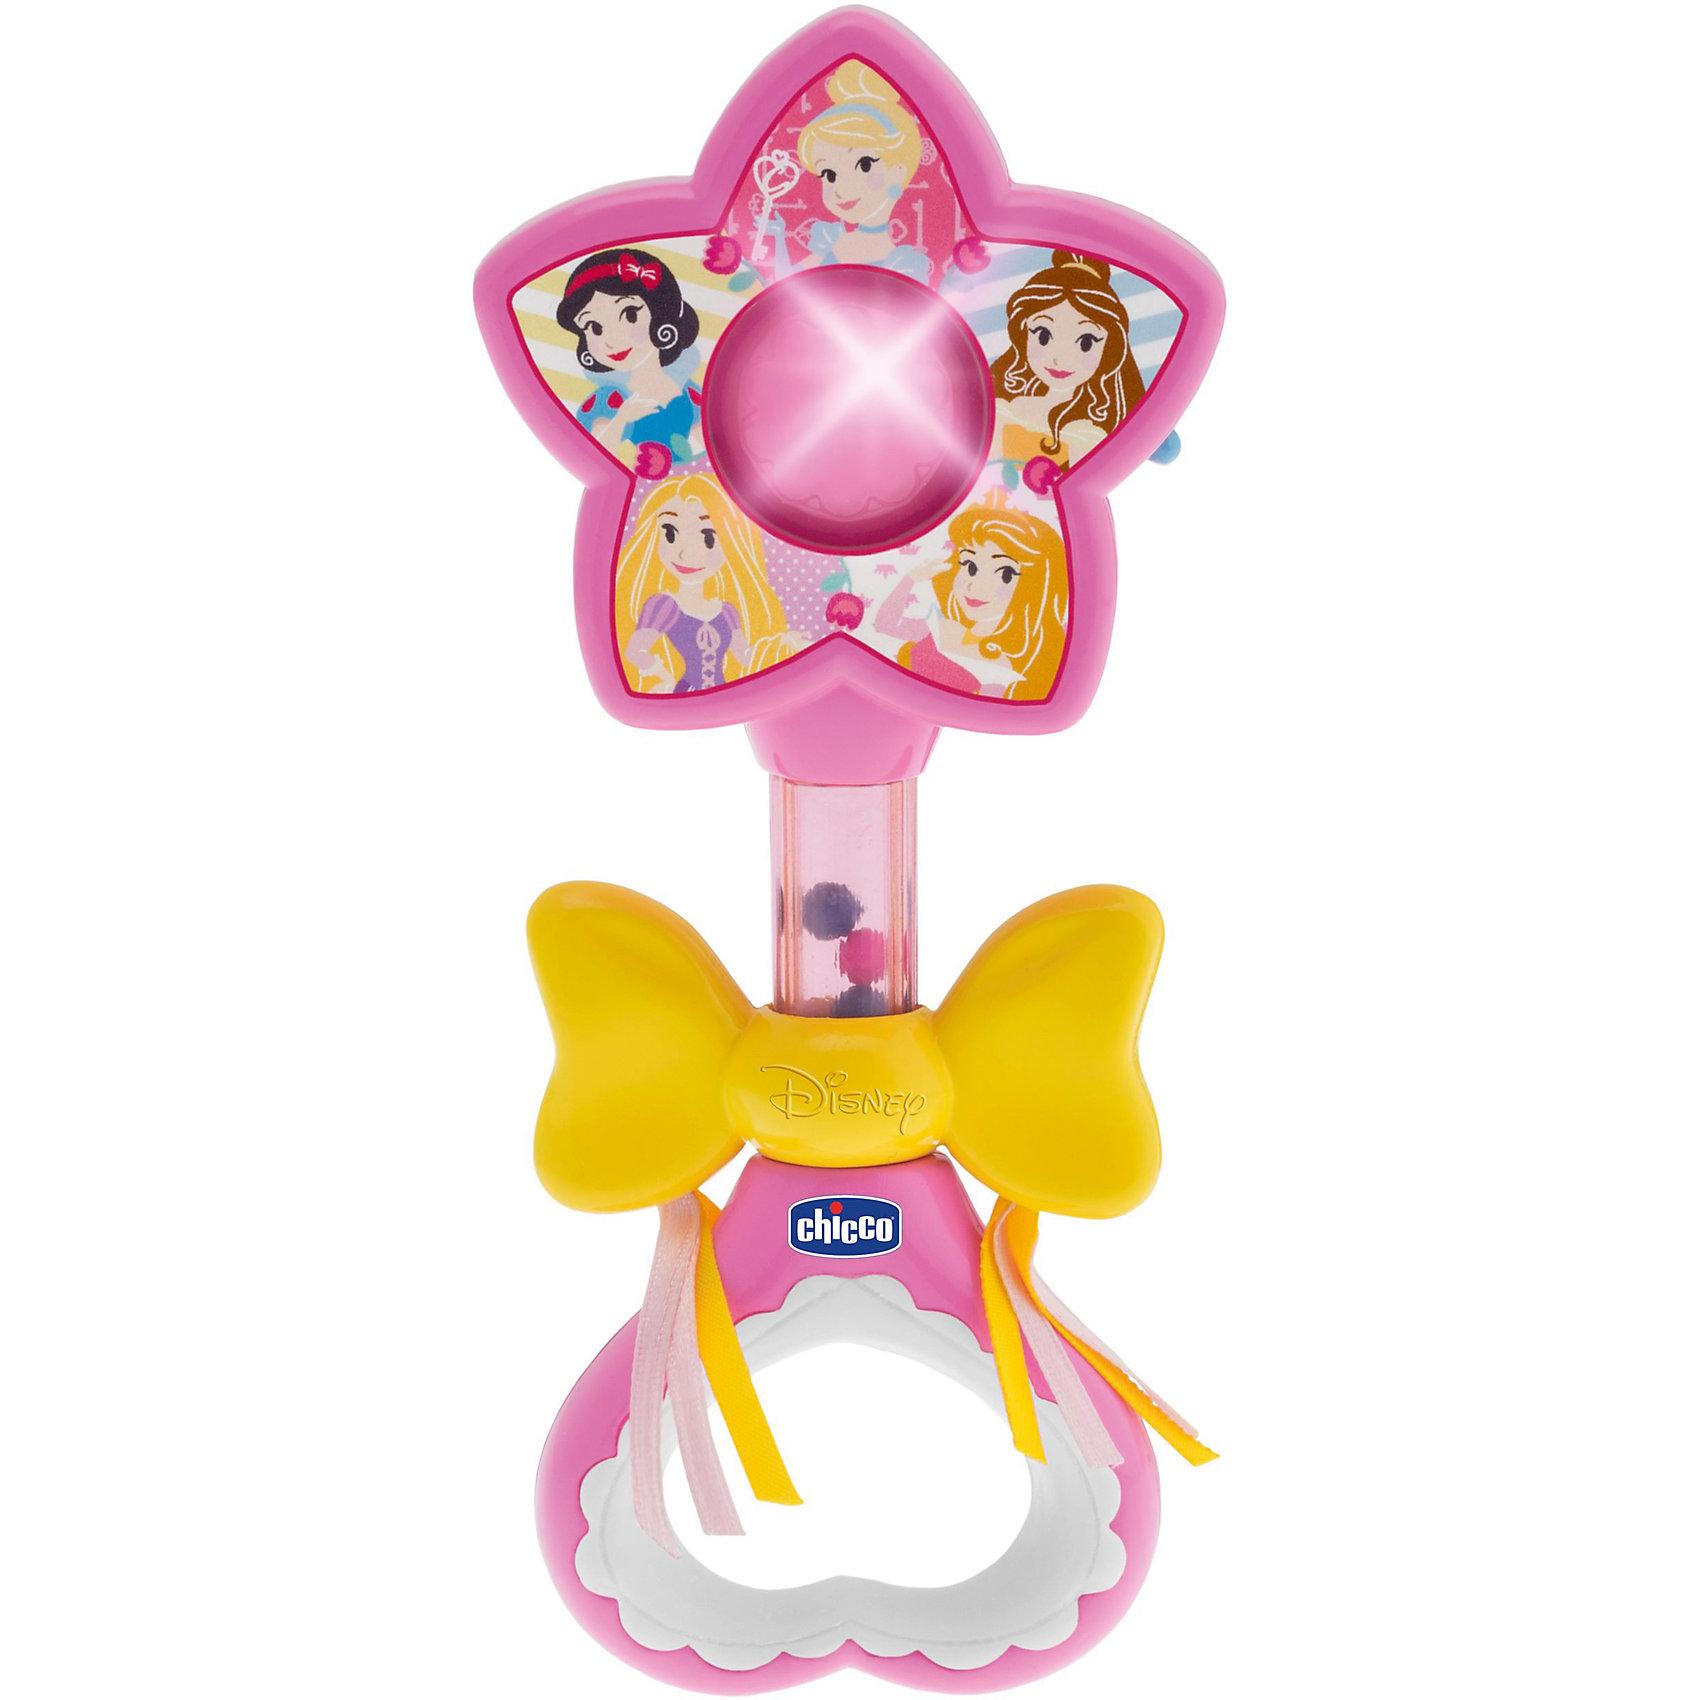 CHICCO Волшебная палочка Принцесс, Disney,  CHICCO chicco волшебный замок принцесс disney